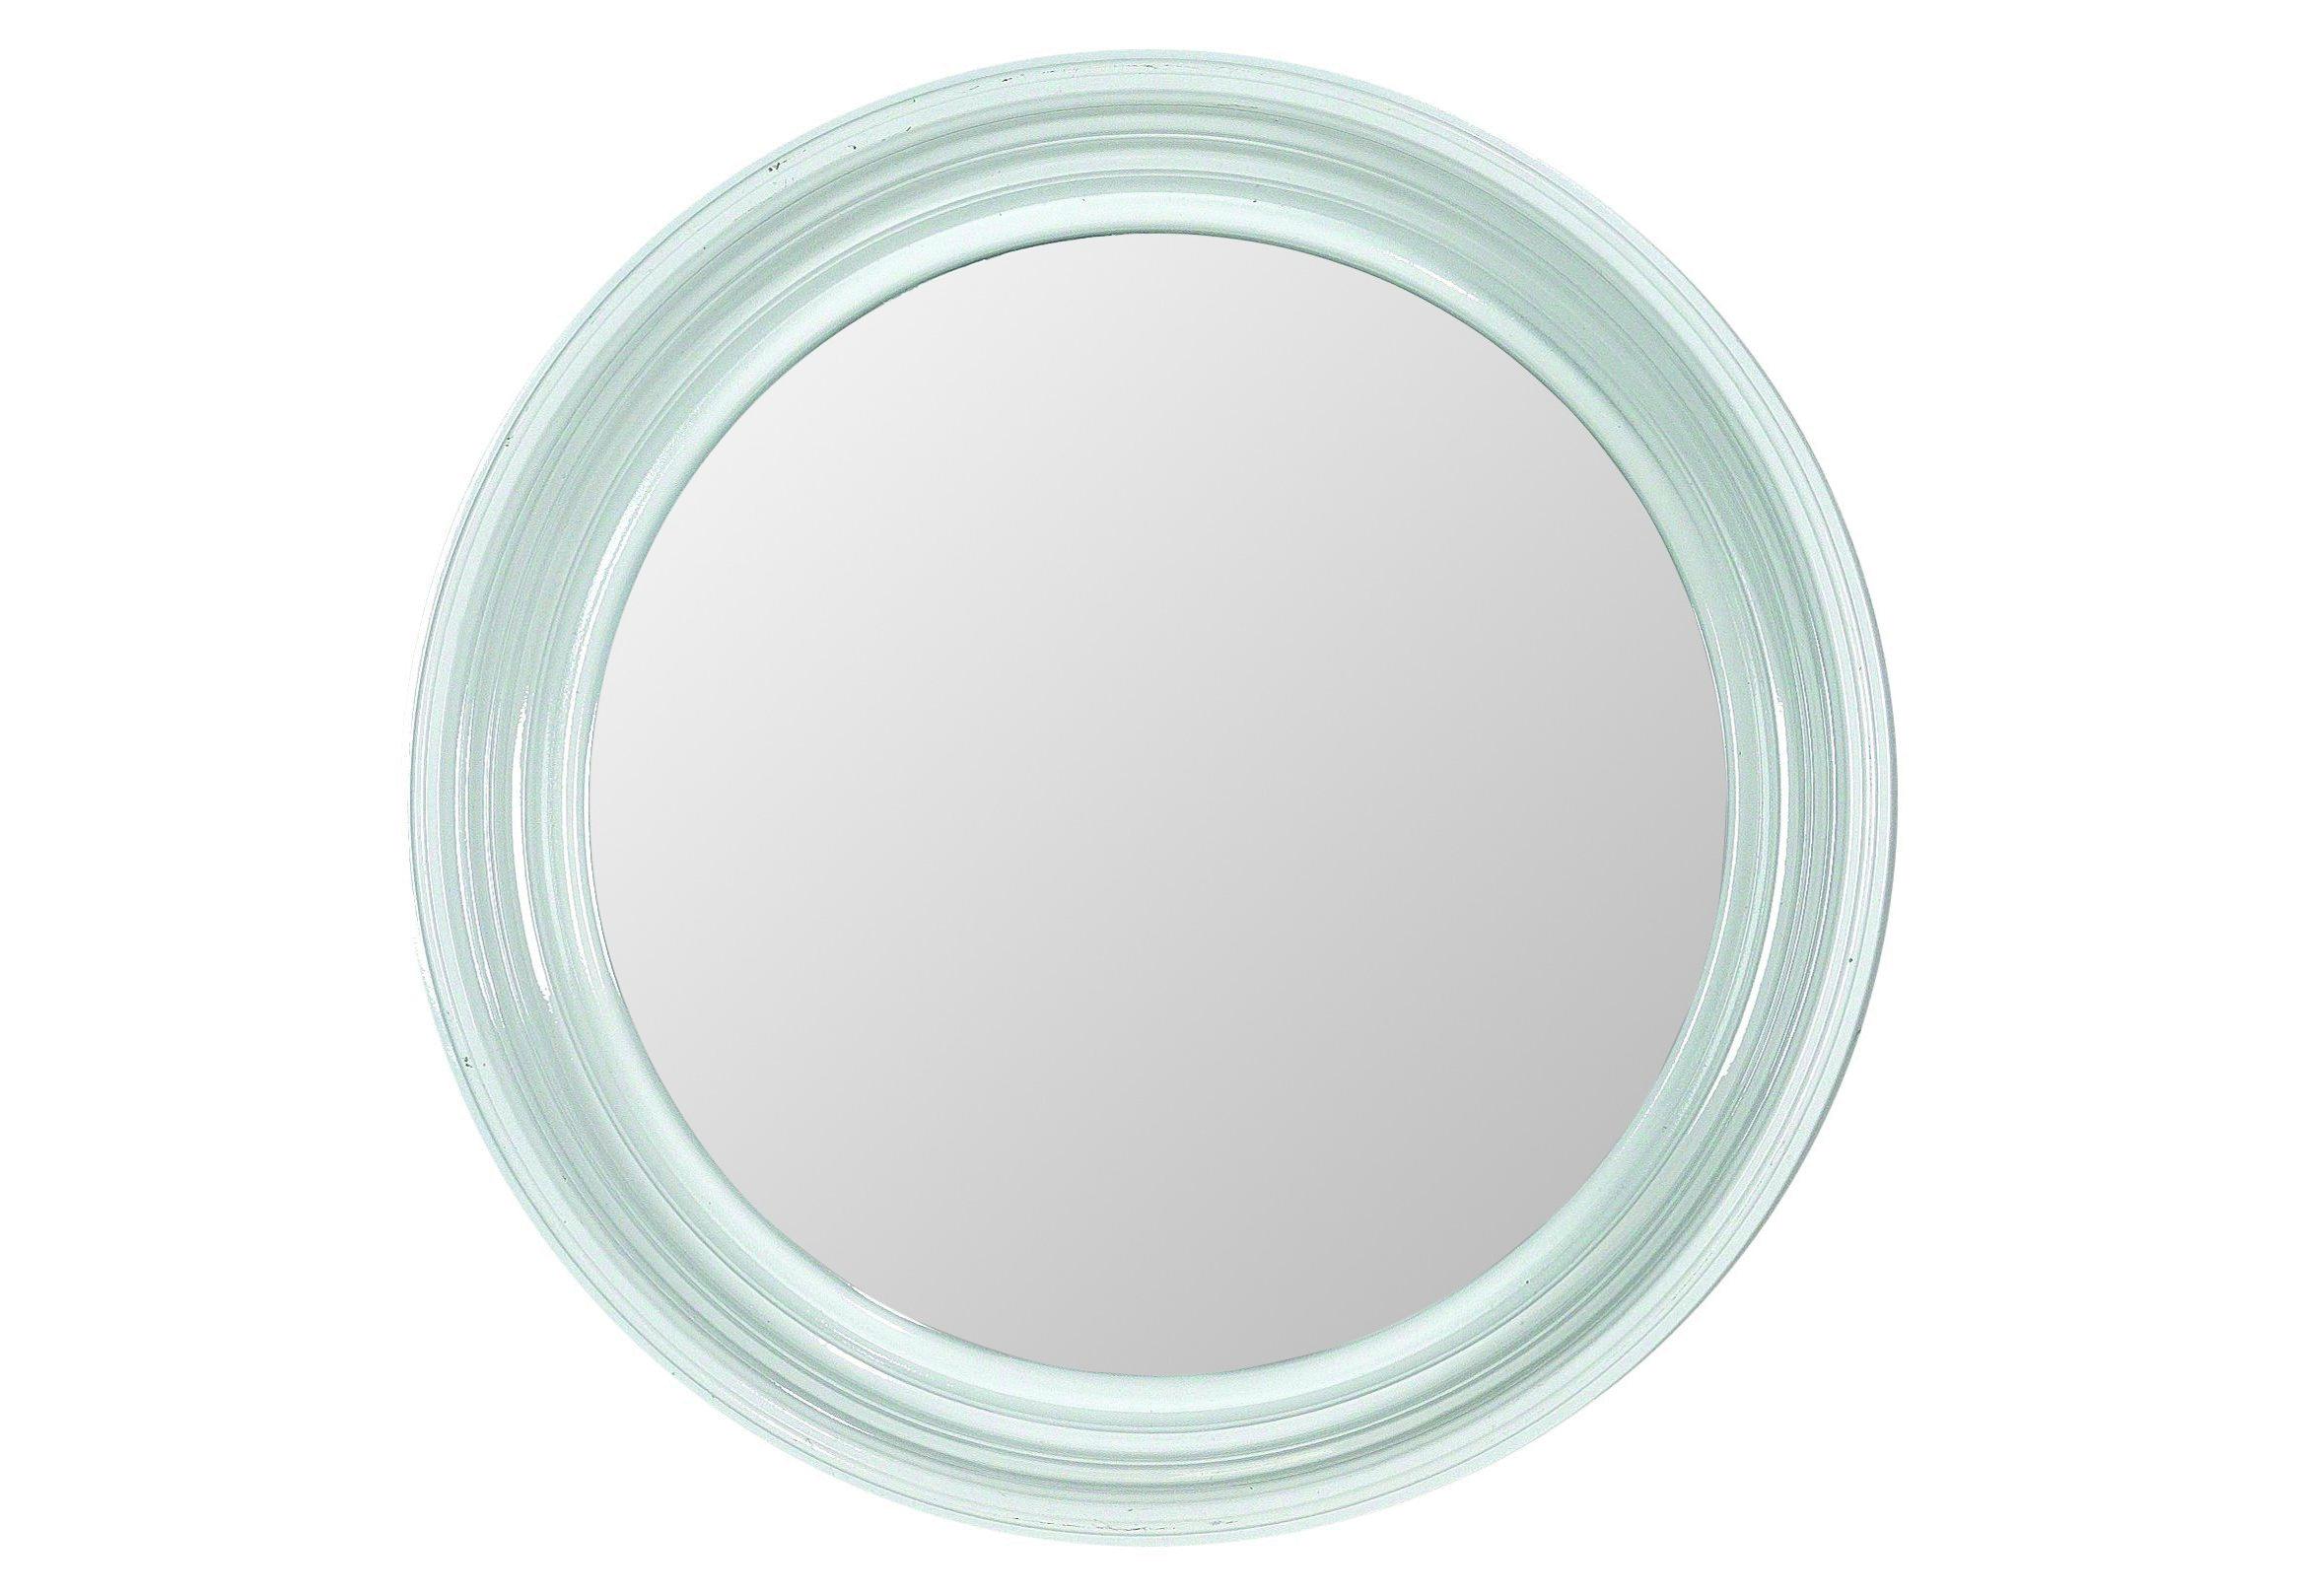 To4rooms Настенное зеркало Fluminimadiore